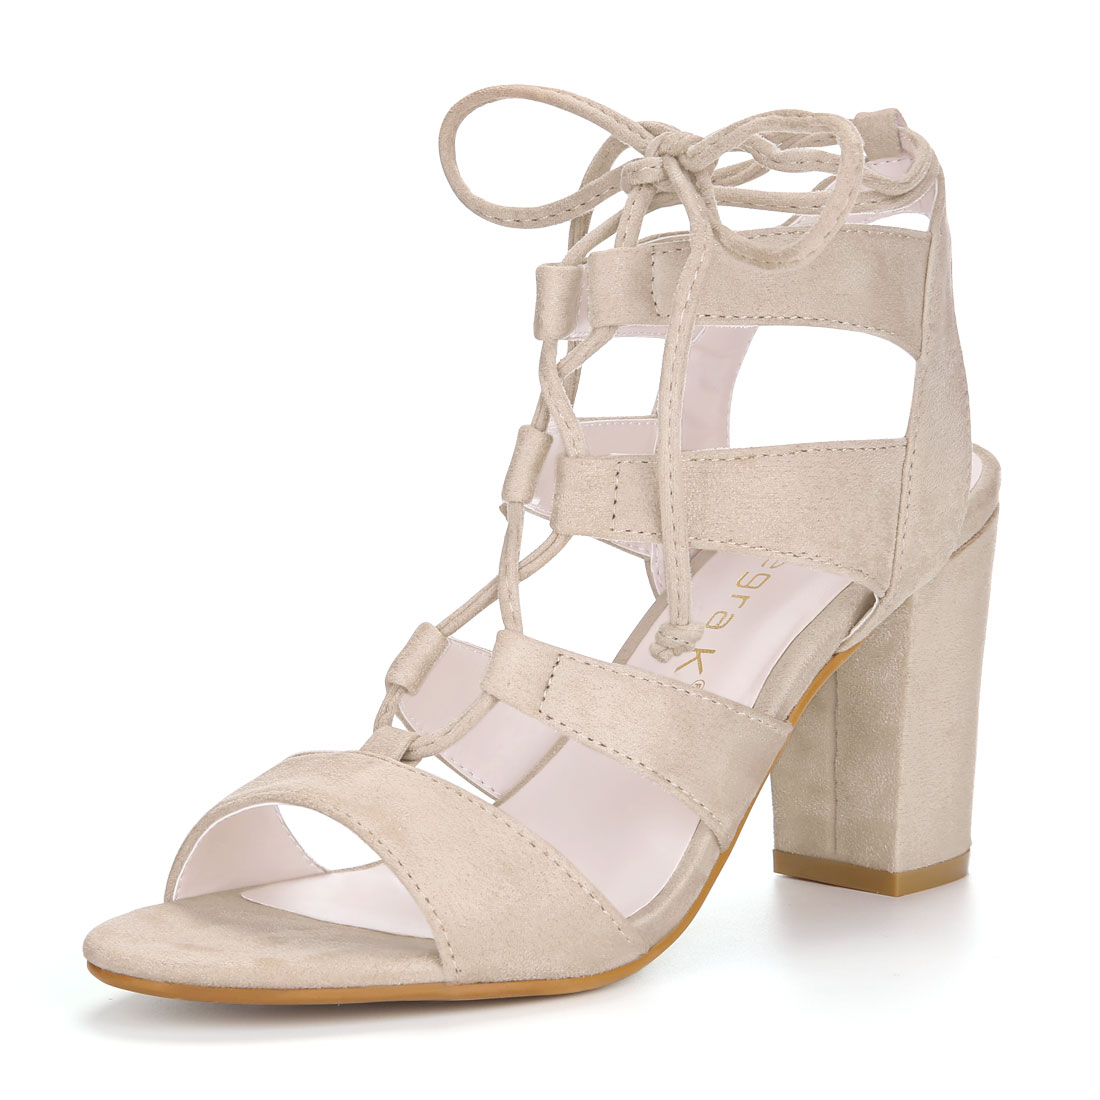 Allegra K Women's Tie Up Strappy Gladiator Block Heel Sandals Red US 8